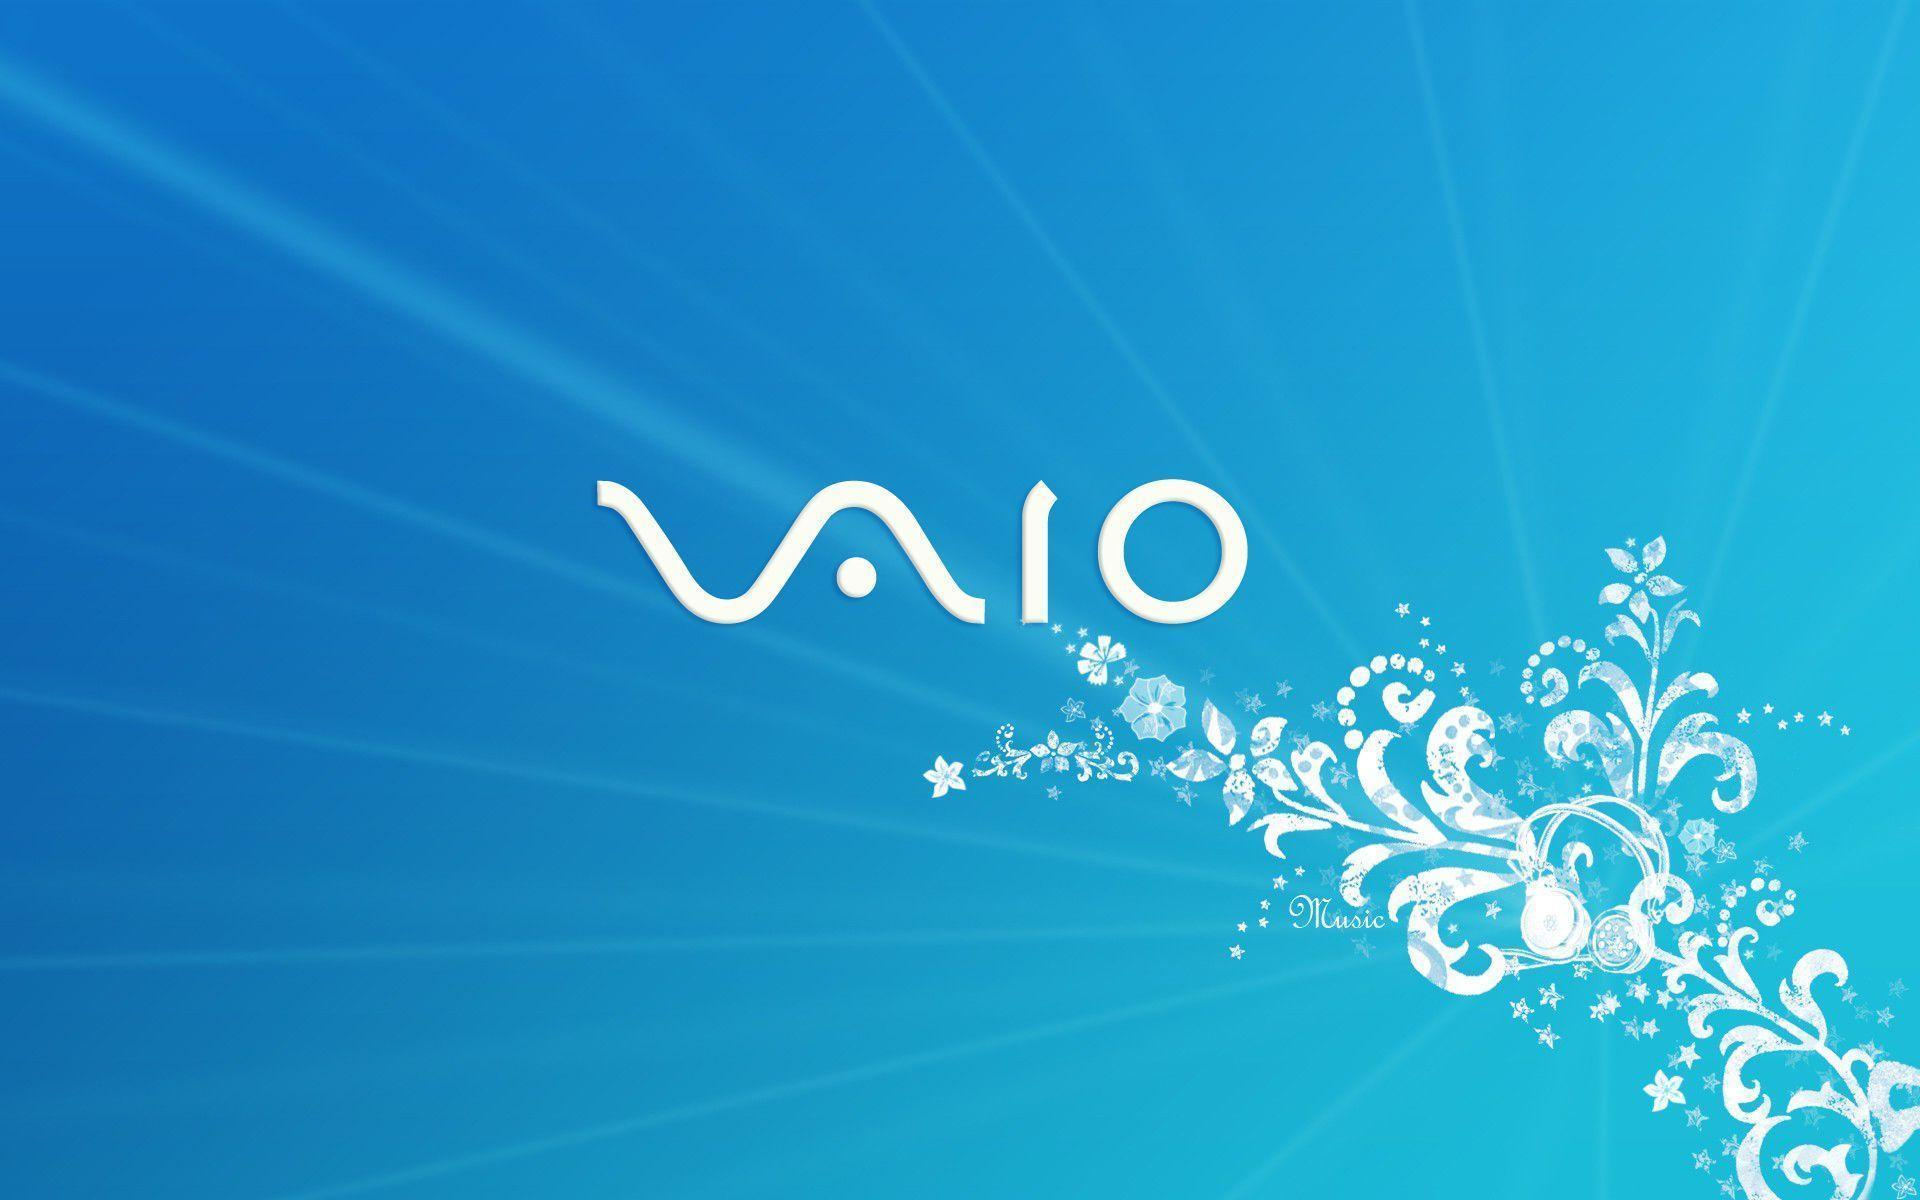 laptops vaio wallpapers 2017 wallpaper cave